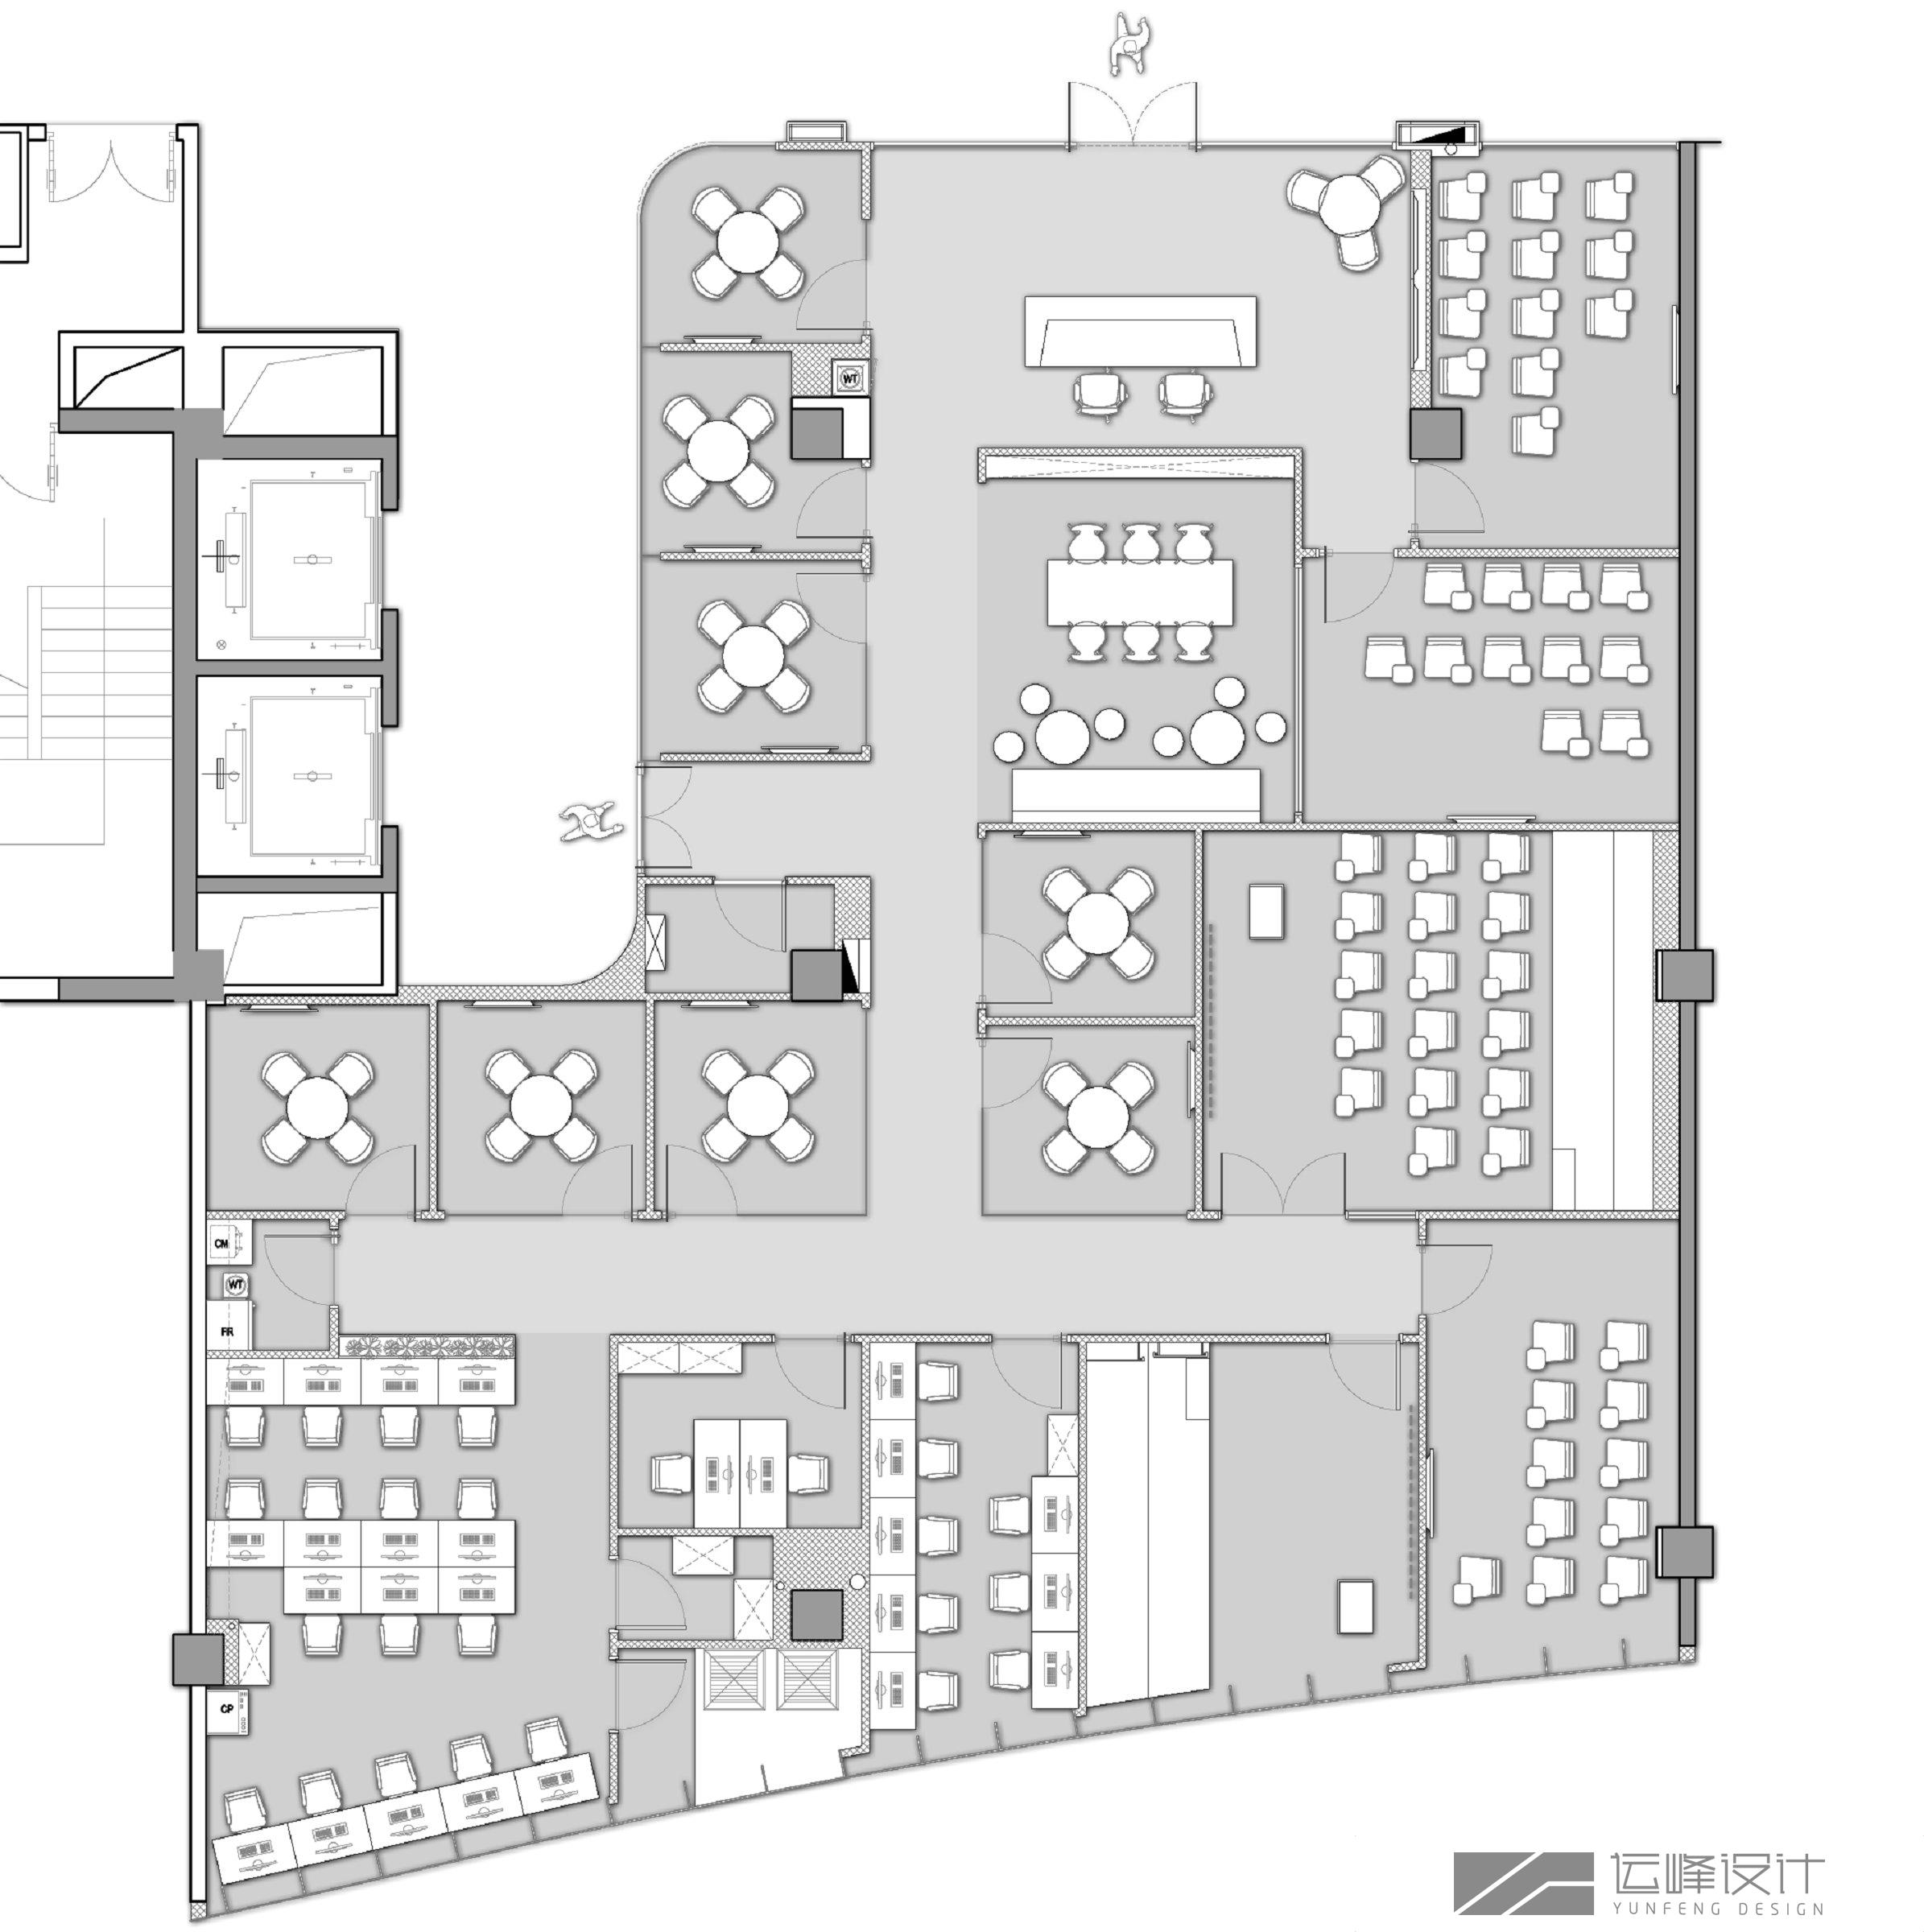 WEBI上海星空广场店平面图20181022-布局1副本.jpg